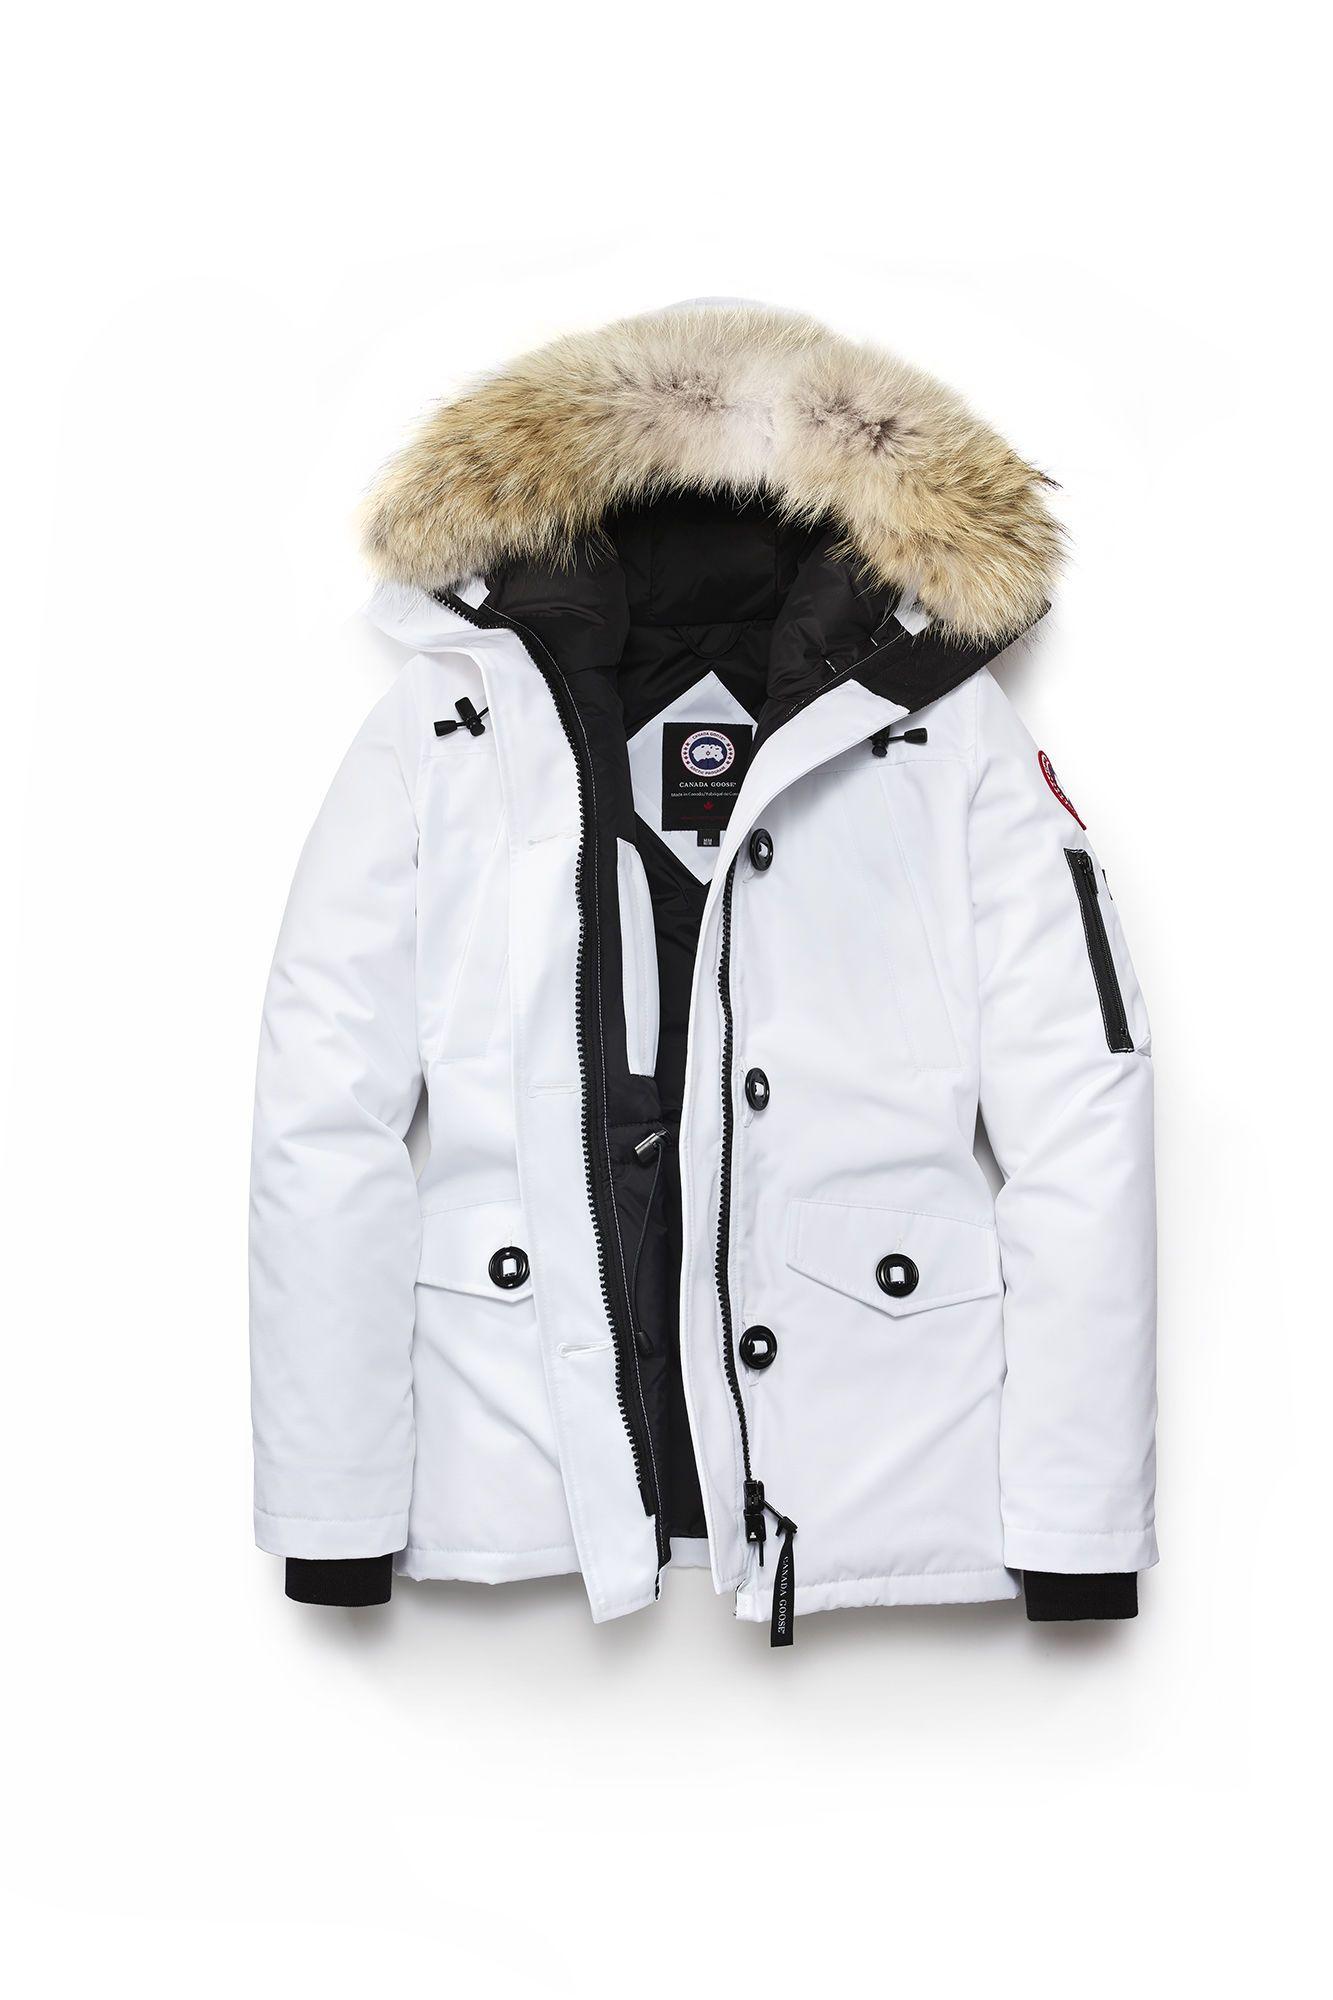 montebello parka canada goose fashion trends parka canada rh pinterest com